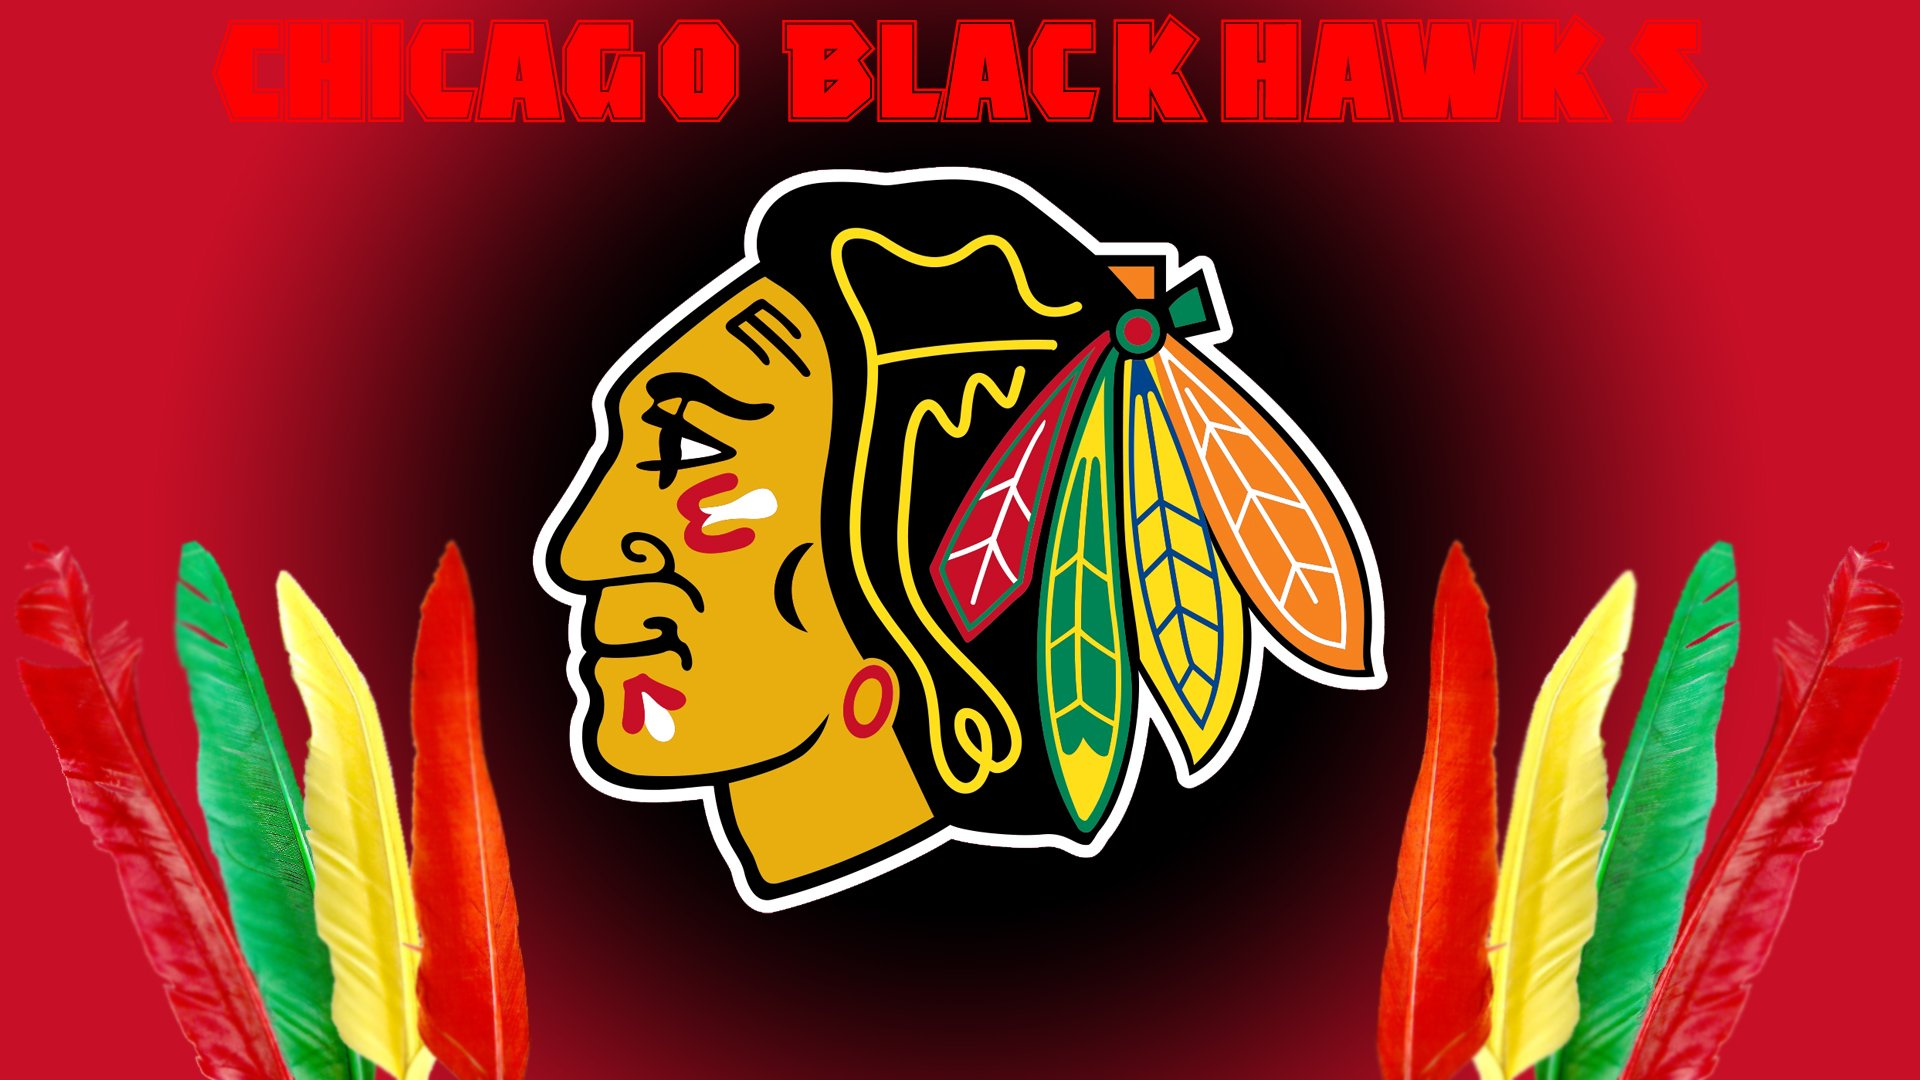 CHICAGO BLACKHAWKS nhl hockey 124 wallpaper 1920x1080 321783 1920x1080